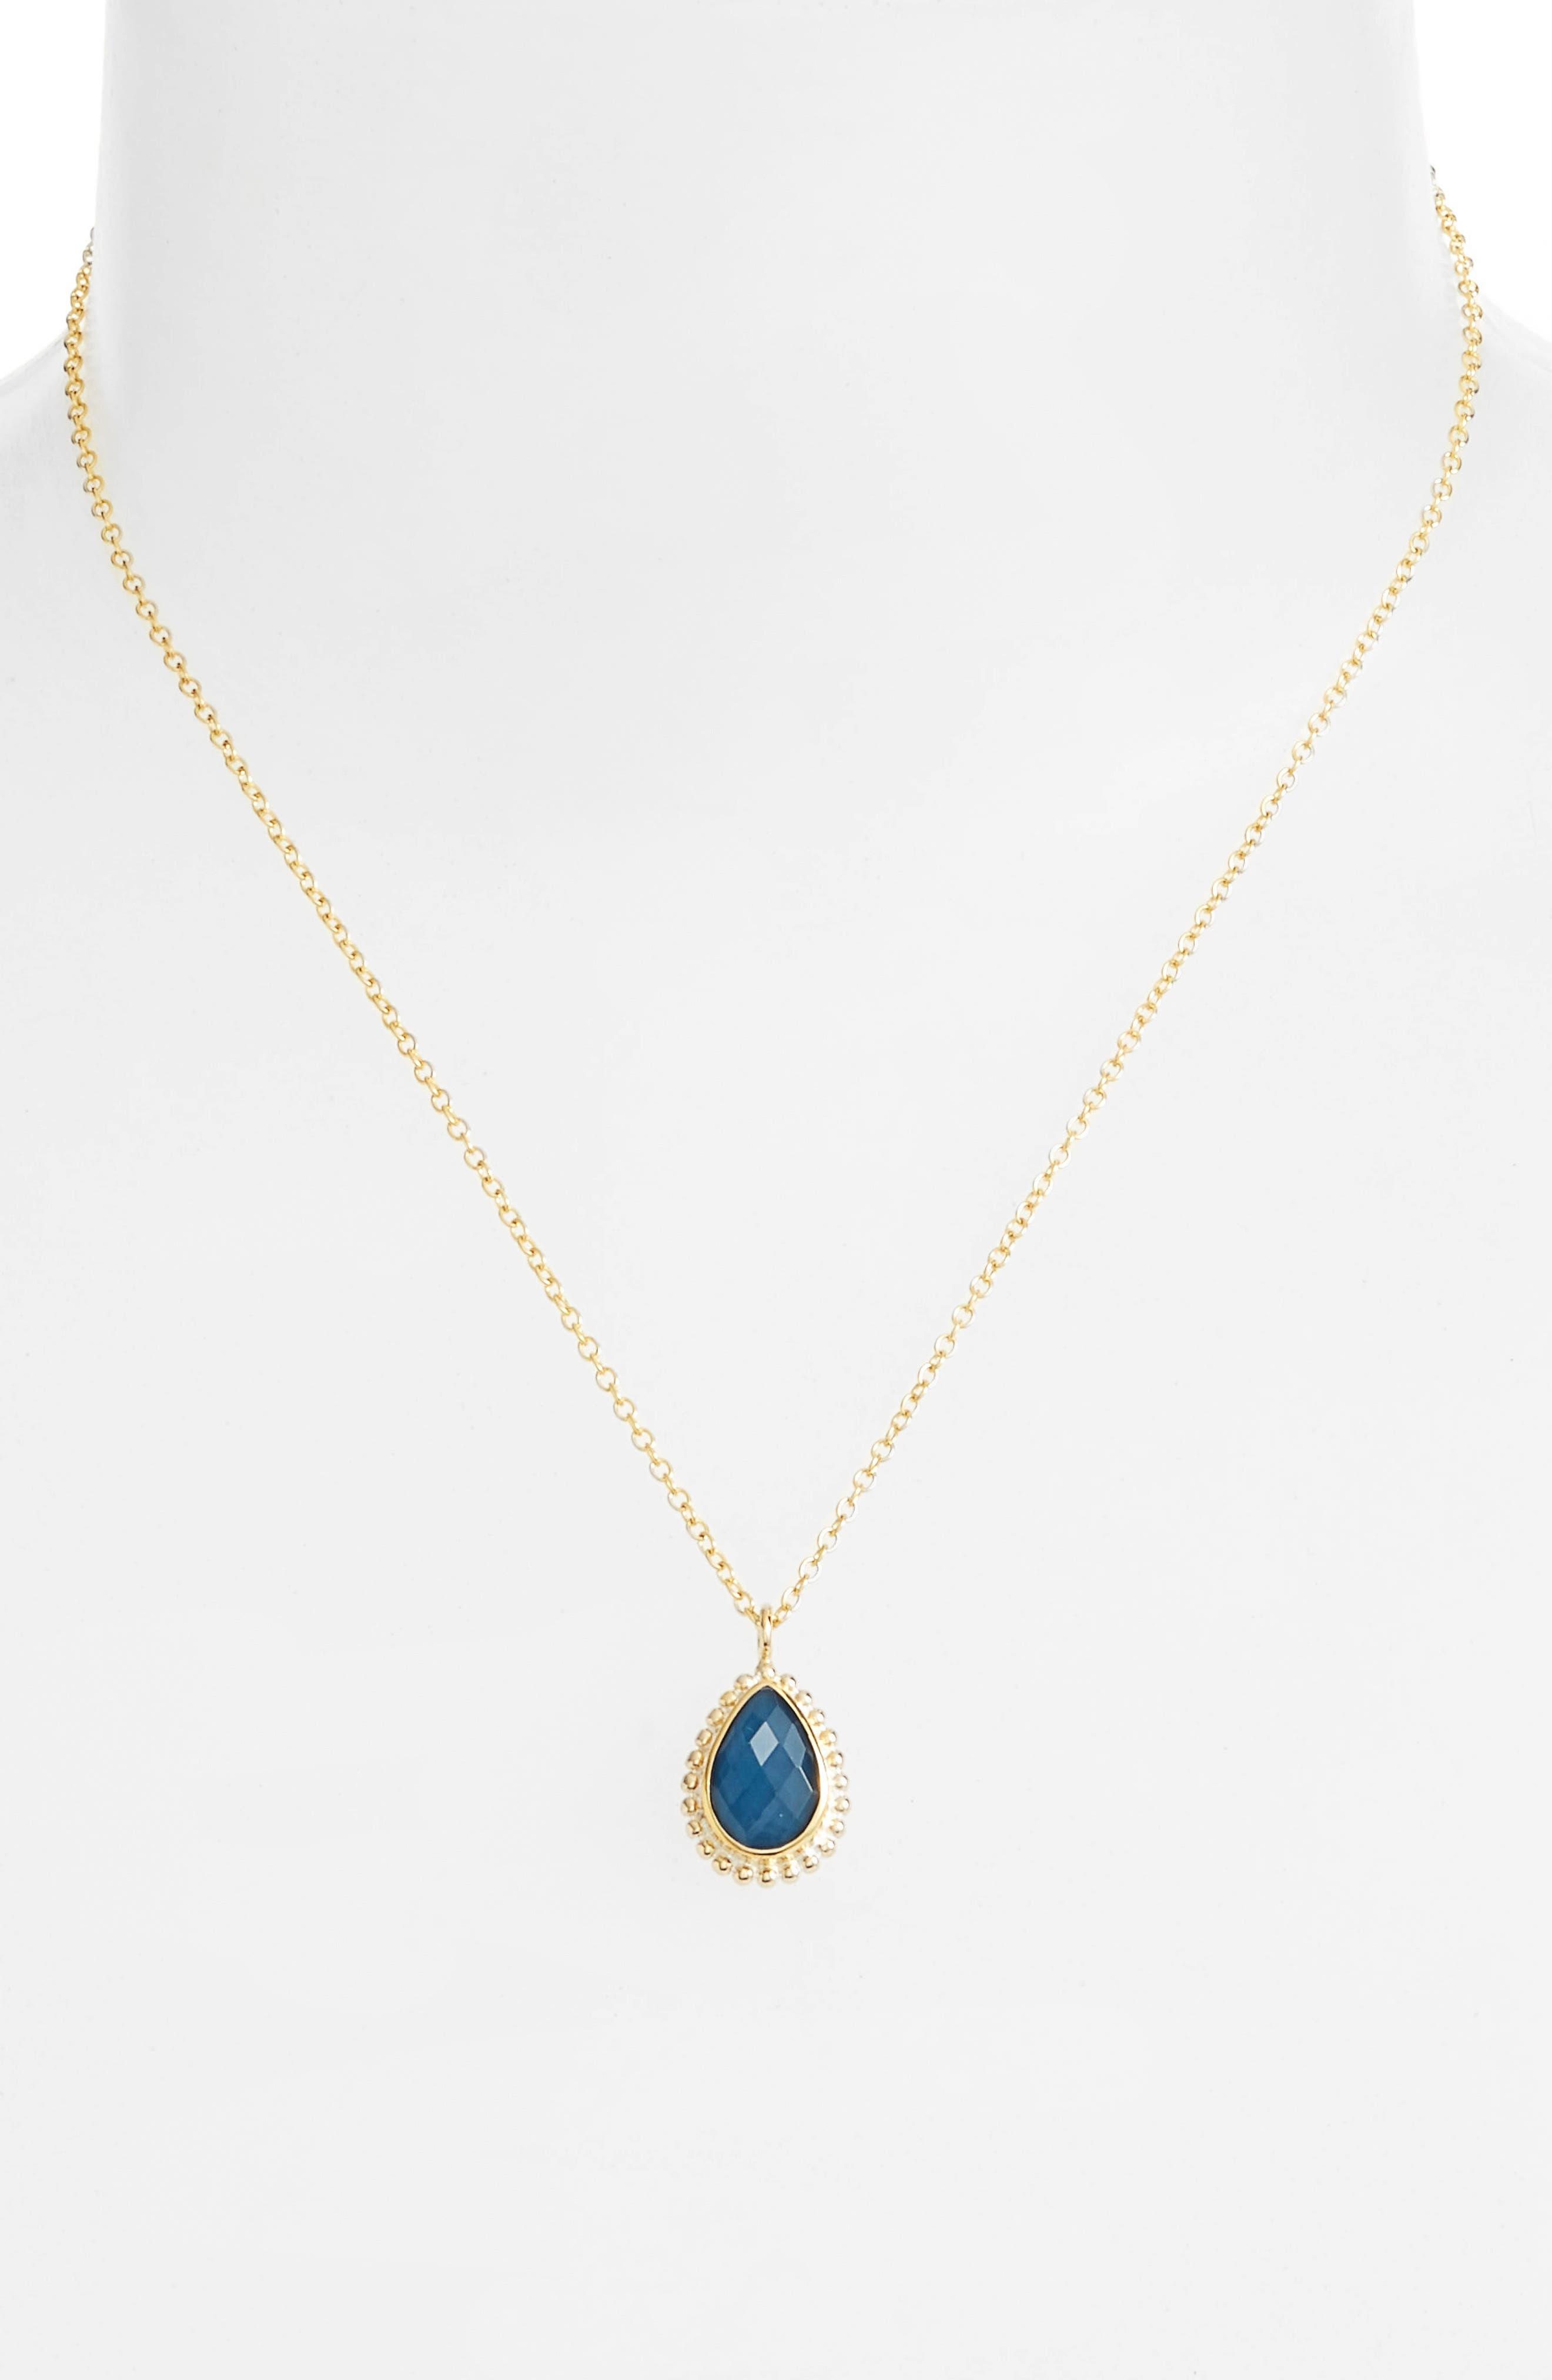 ANNA BECK Blue Quartz Teardrop Pendant Necklace